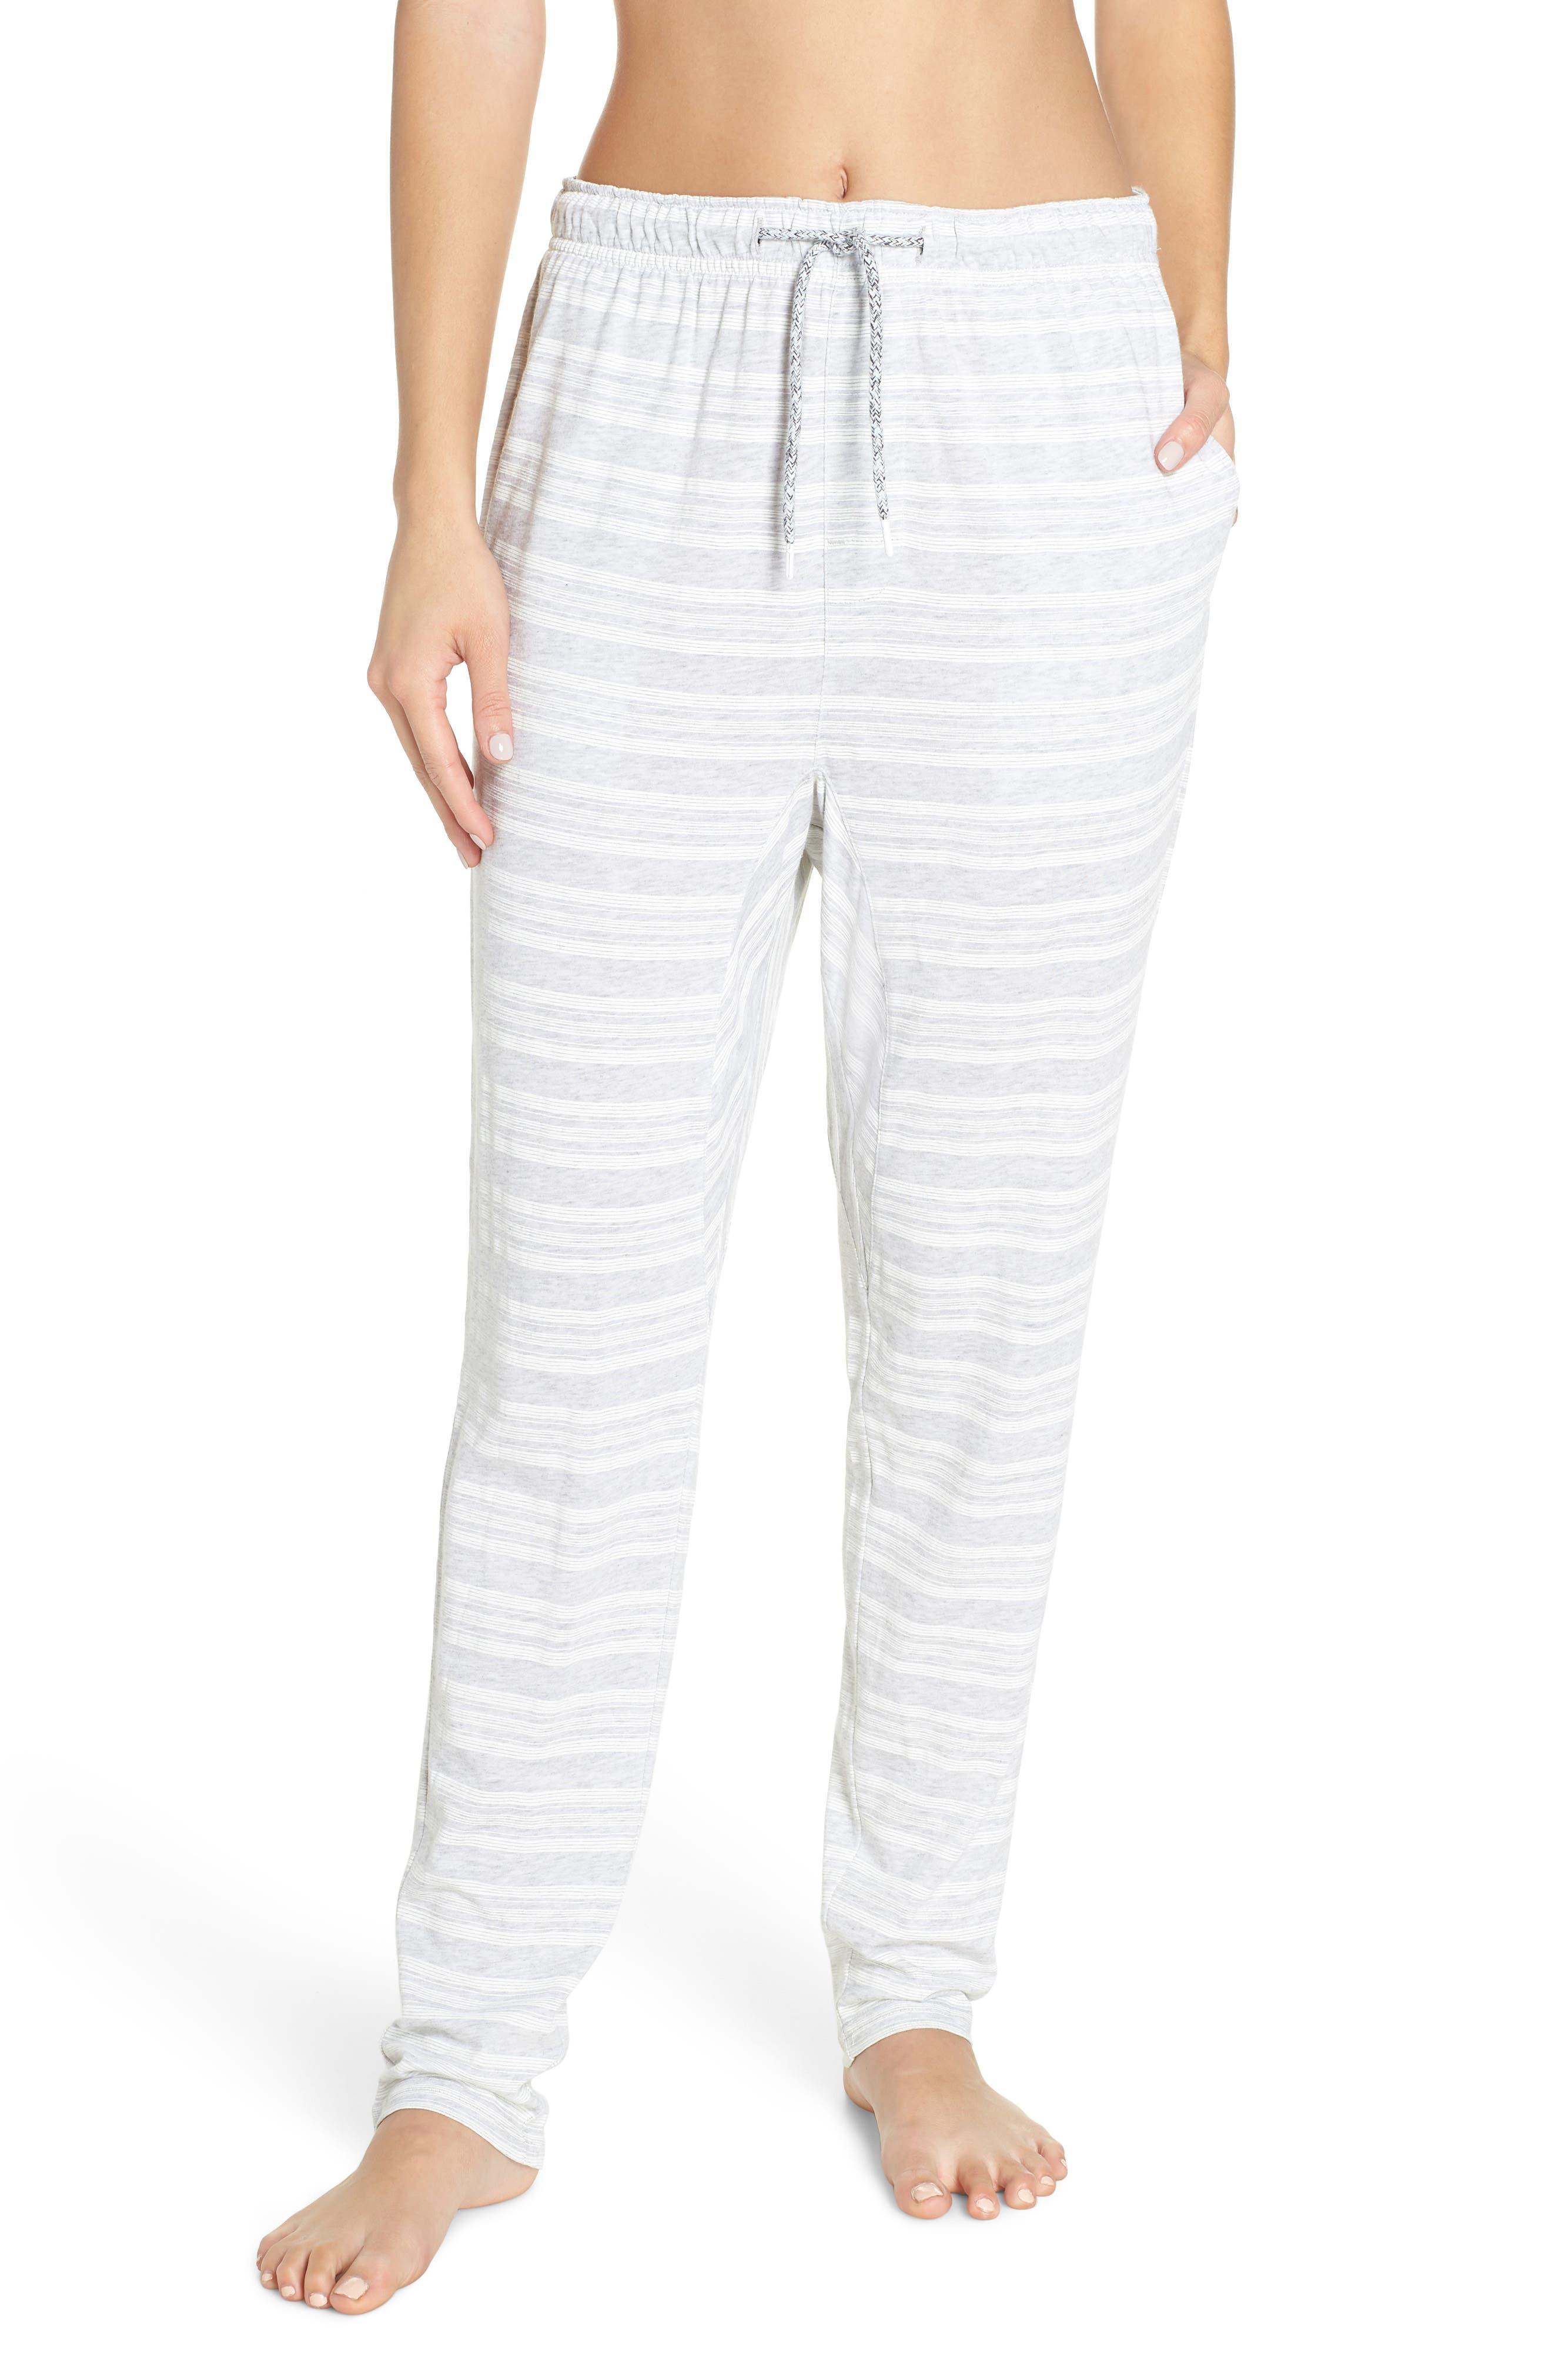 Alice Pajama Pants,                             Main thumbnail 1, color,                             LOLLY STRIPE WHITE